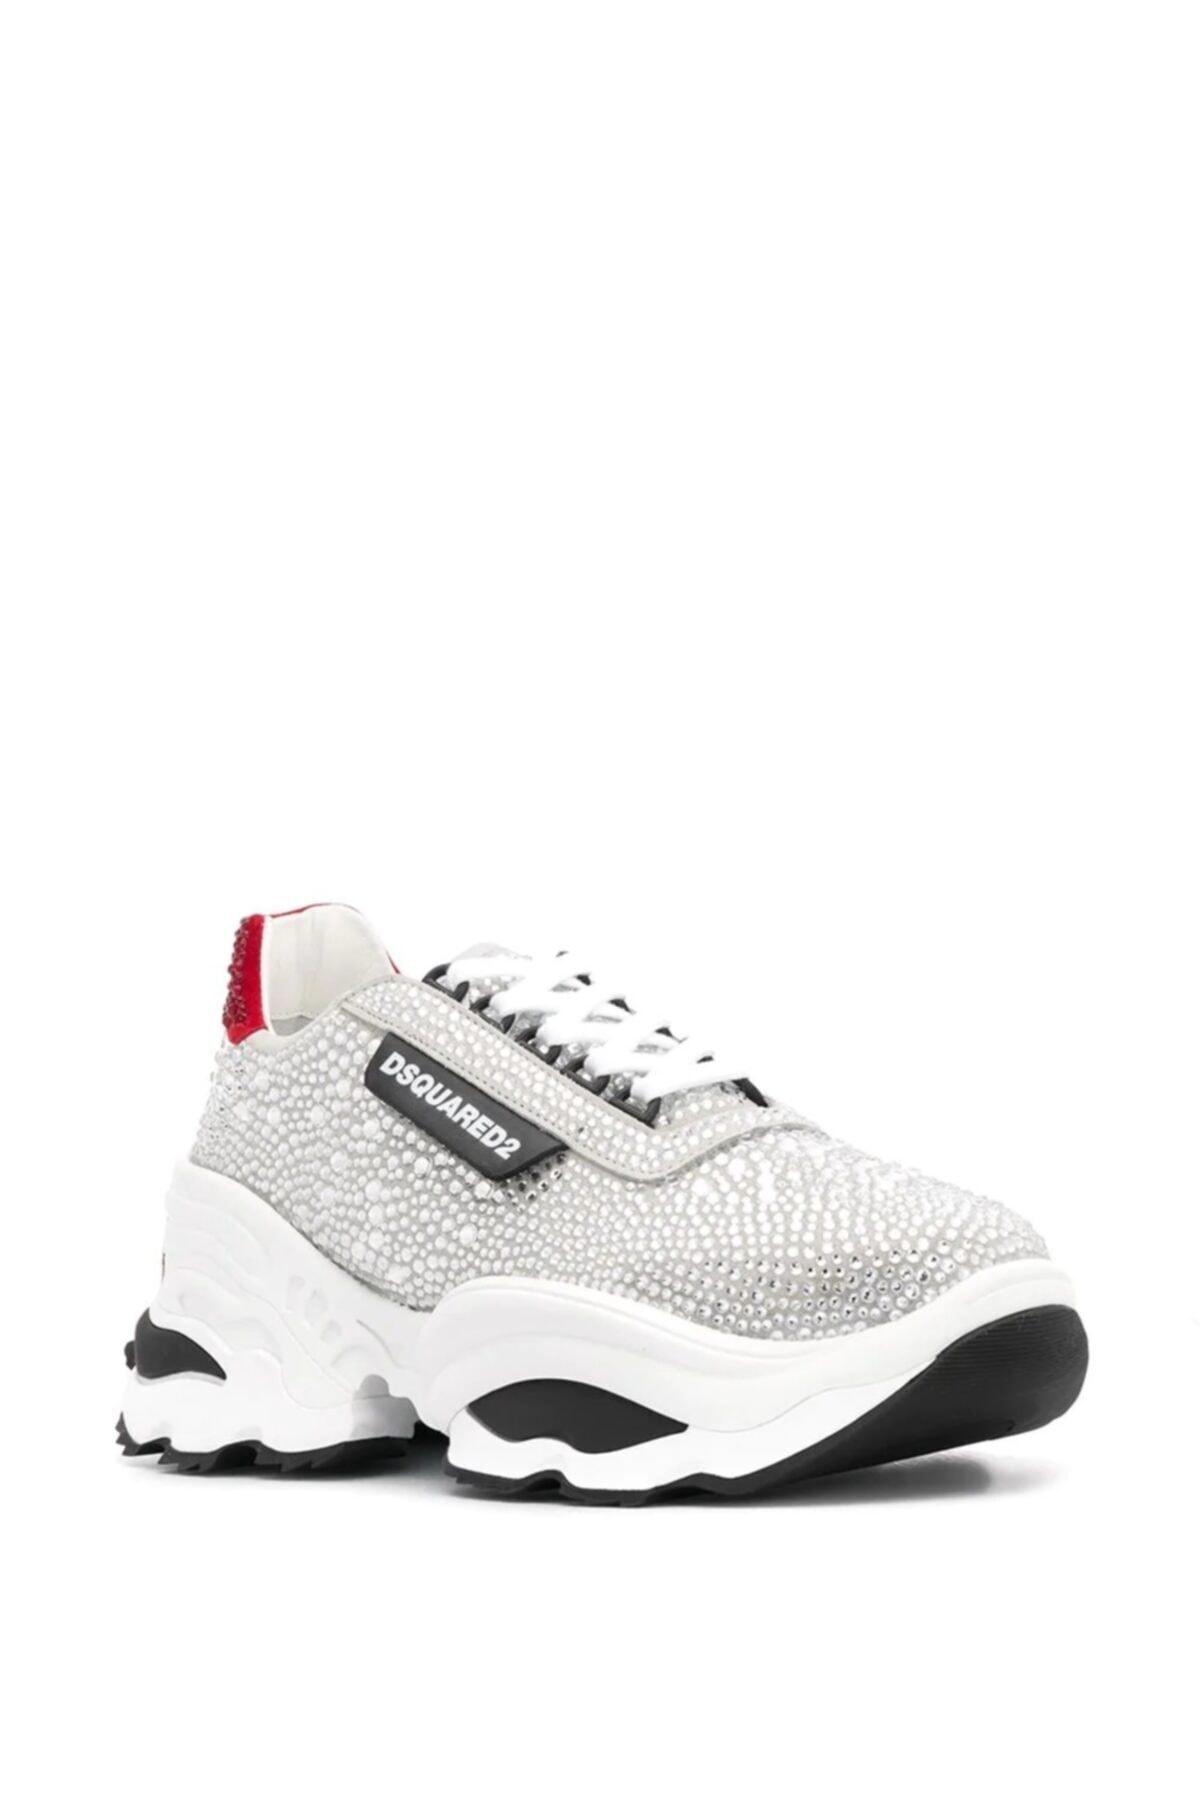 DSquared2 Erkek Beyaz Ayakkabı Snm0136-01603145-m1260 2